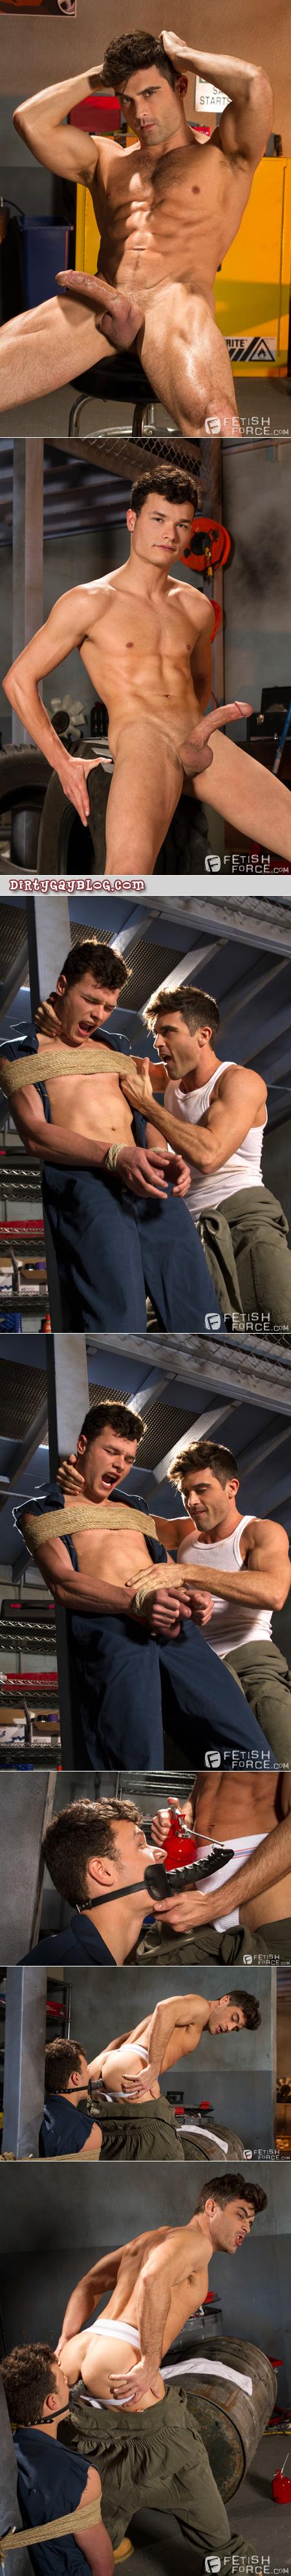 Gay bondage humiliations in the mechanic garage.